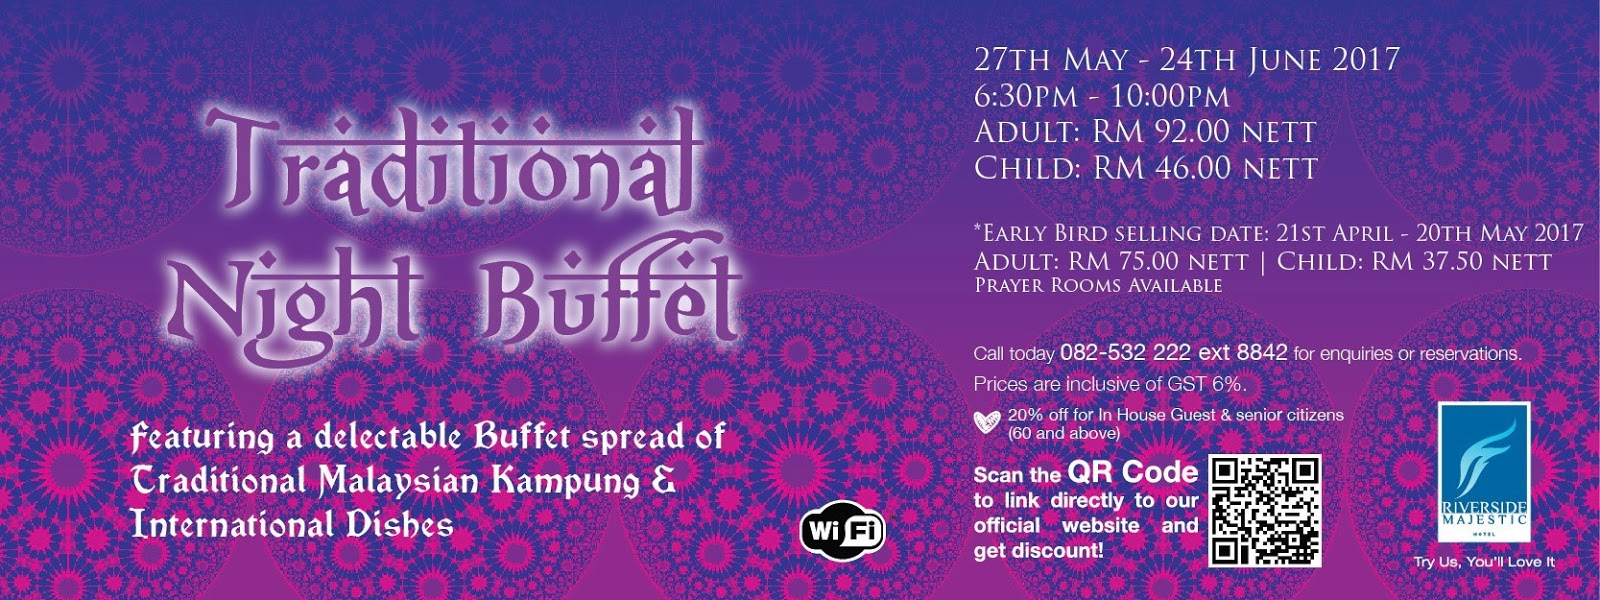 Buffet Ramadhan riverside majestic hotel Sarawak 2017